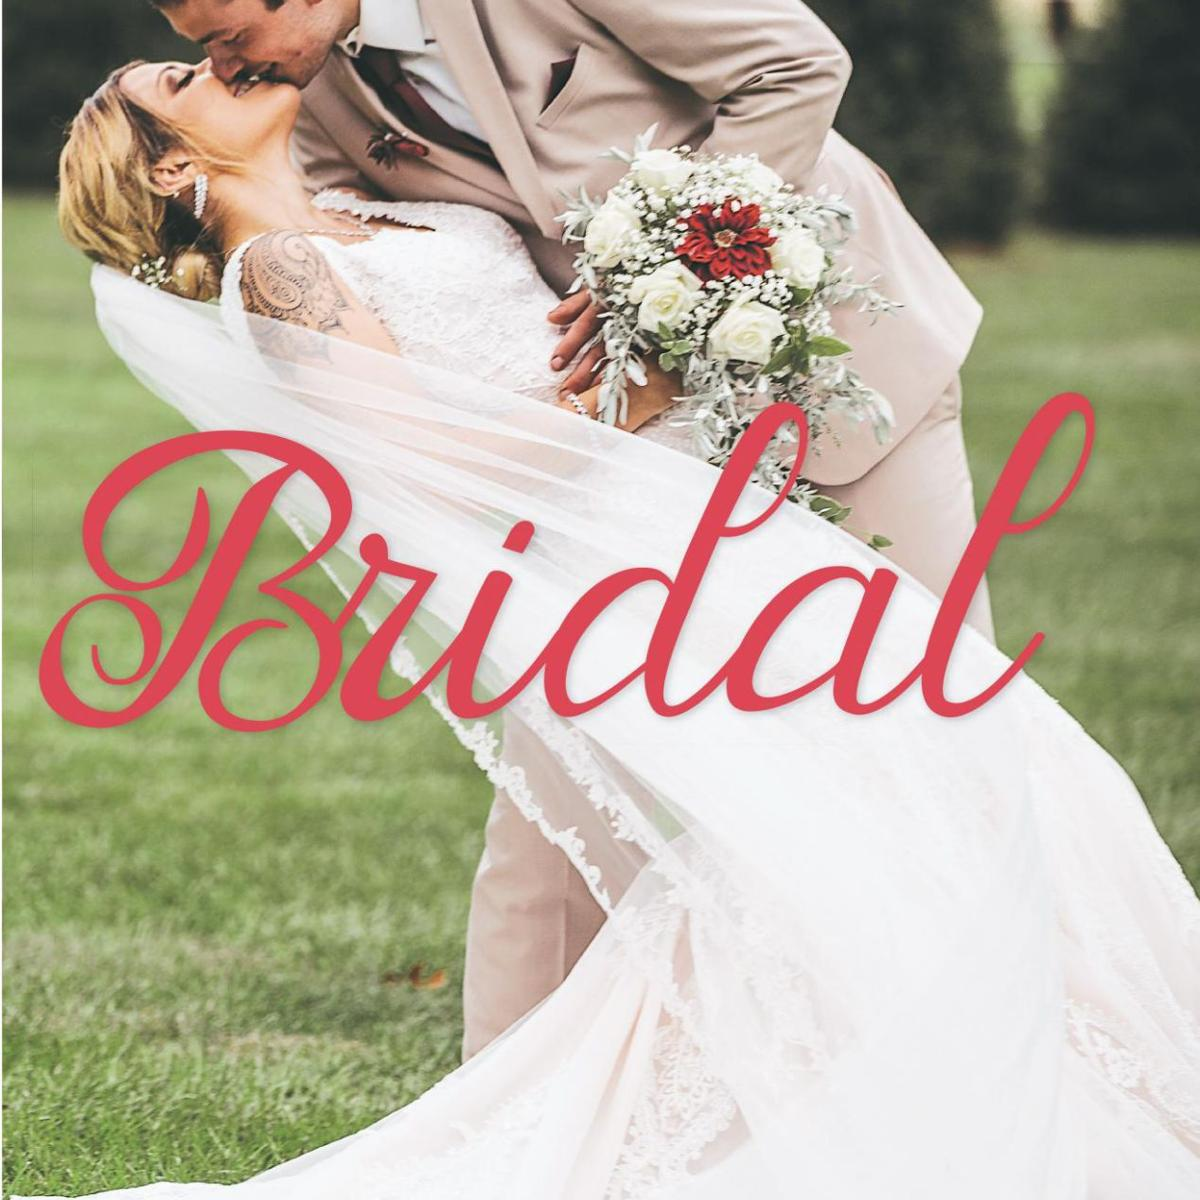 2019 Bridal Guide